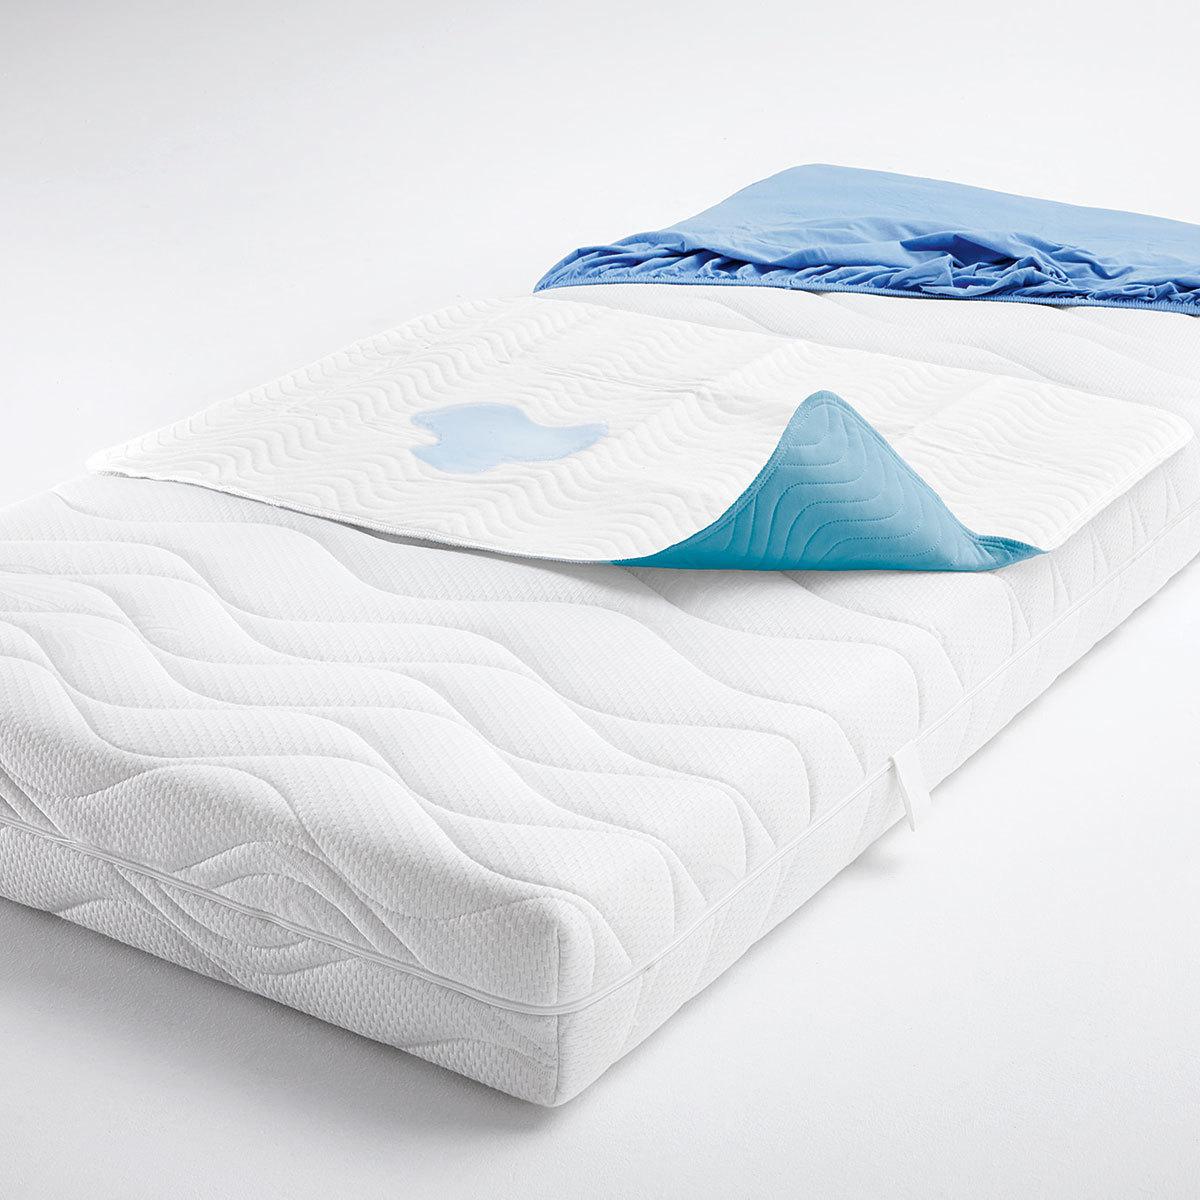 Dormisette Inkontinenzauflage 5-lagig